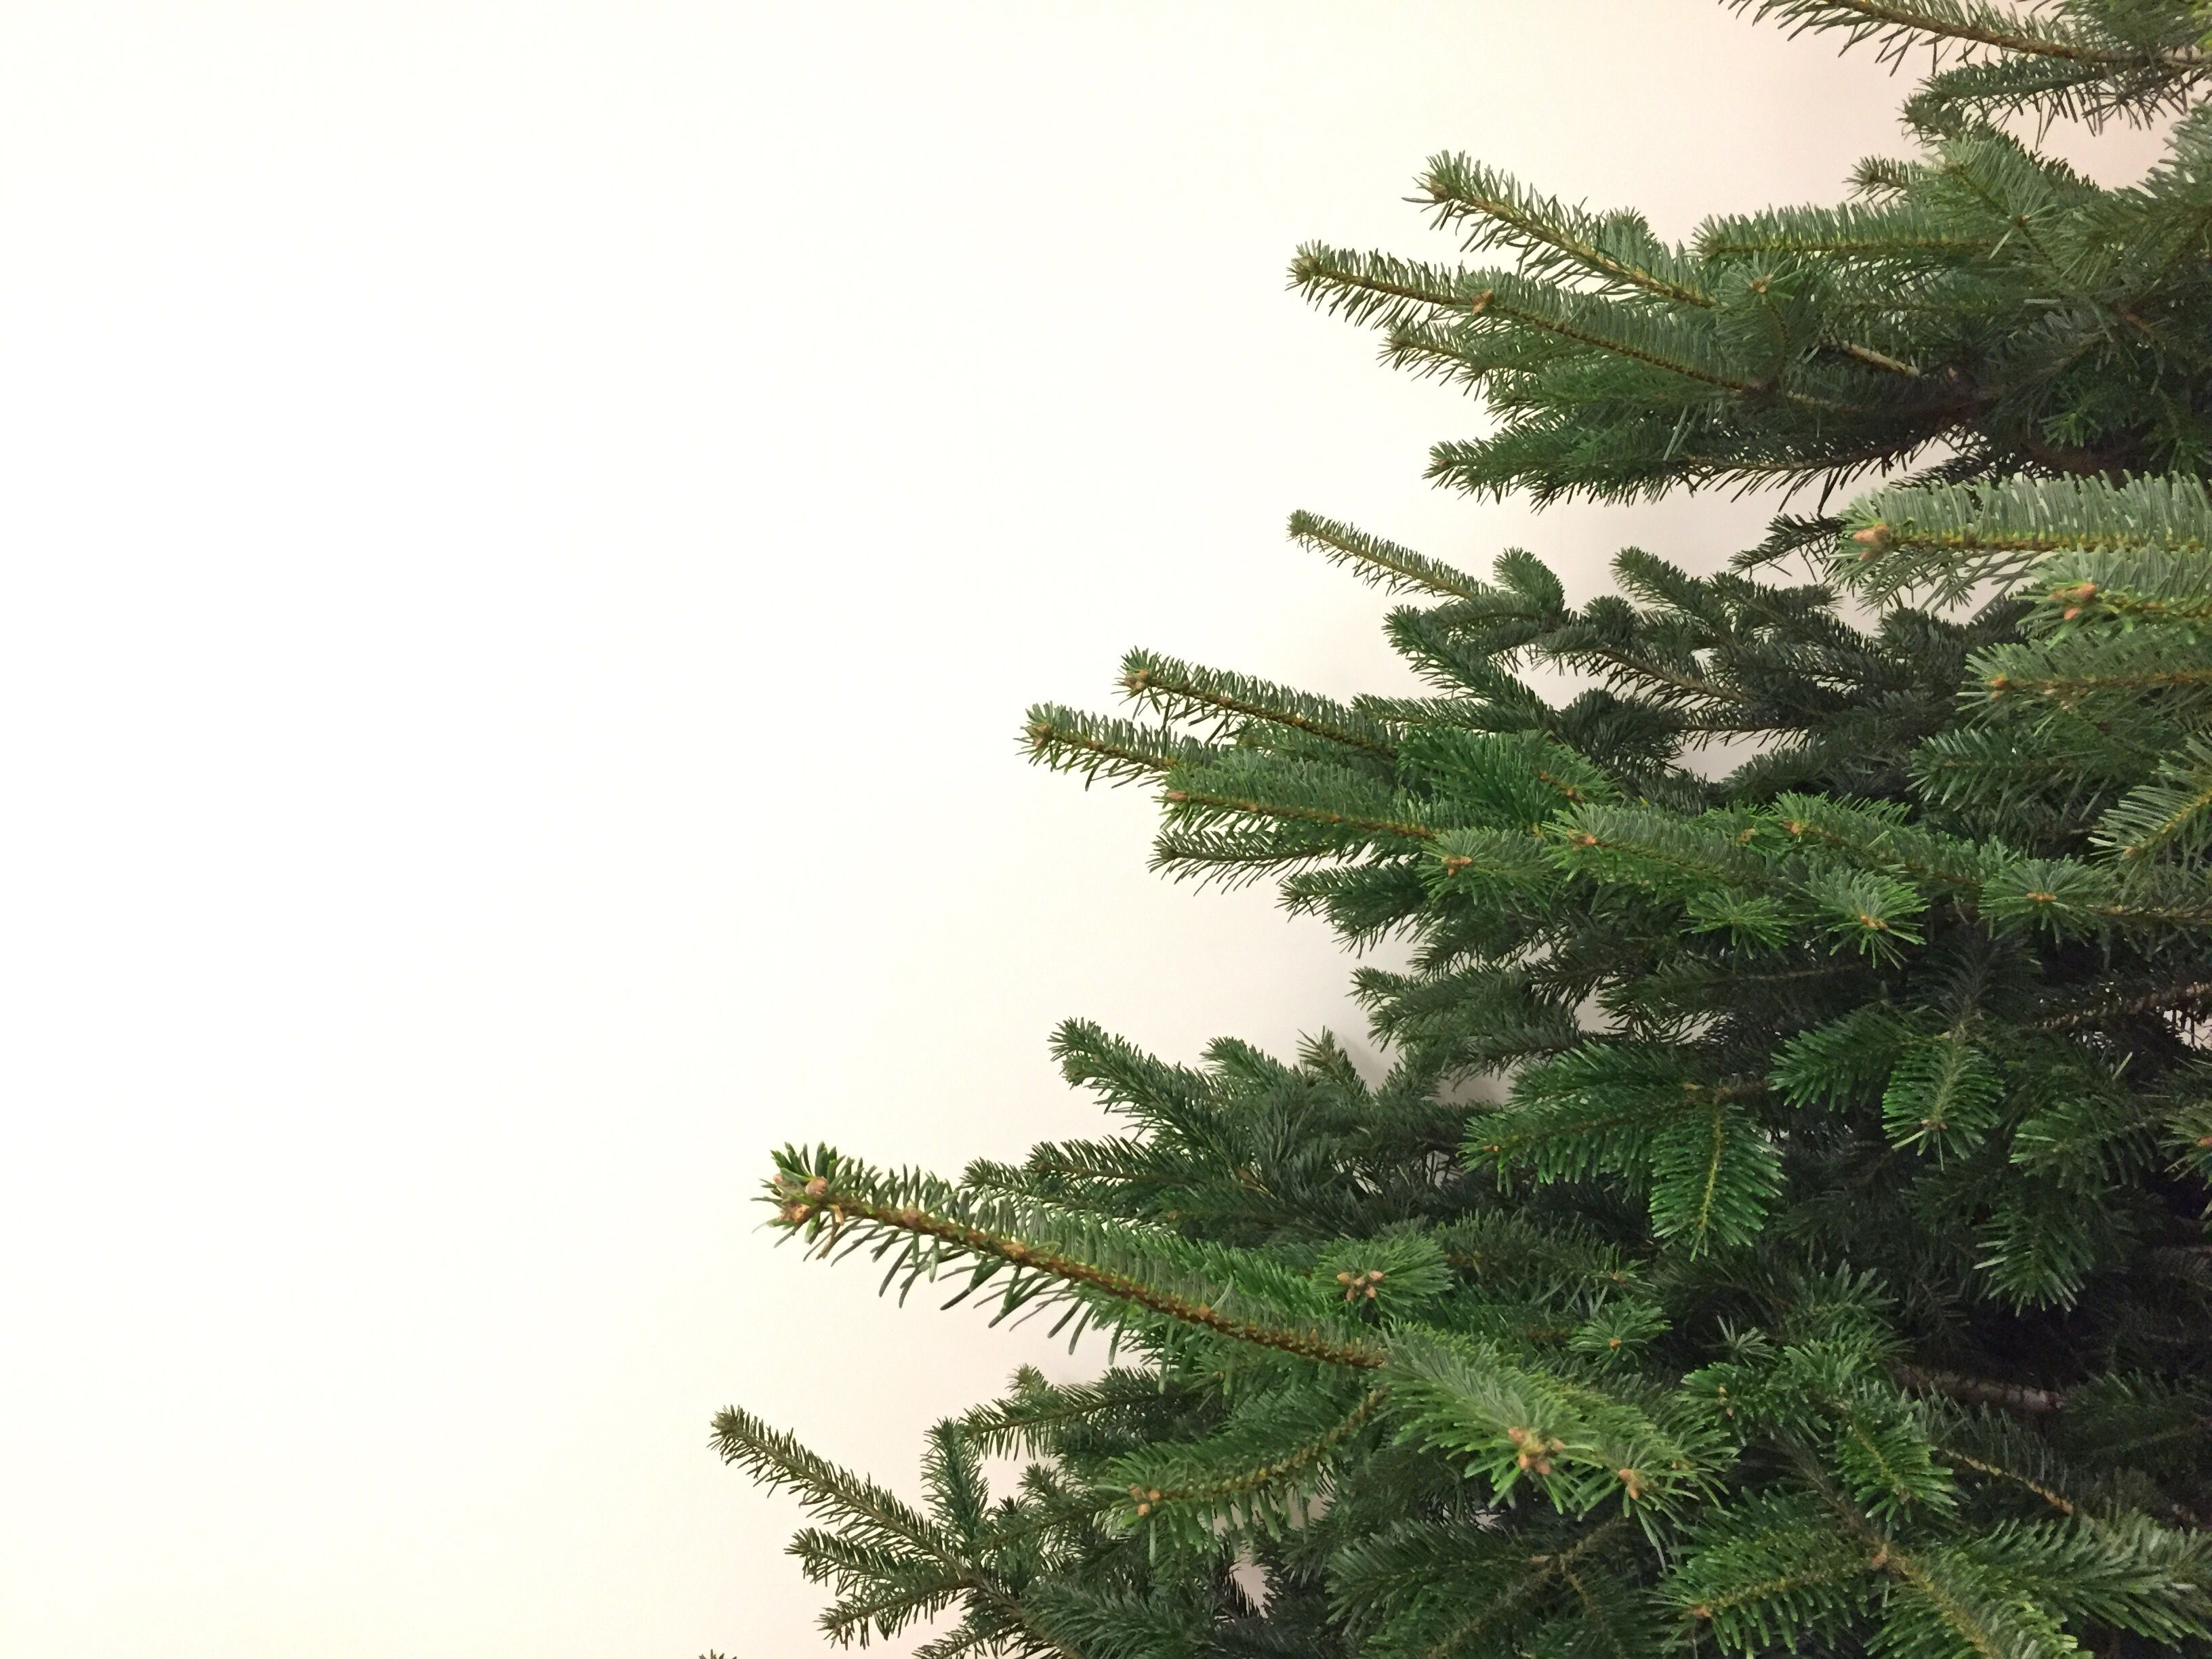 9 Steps for Displaying a Living Christmas Tree